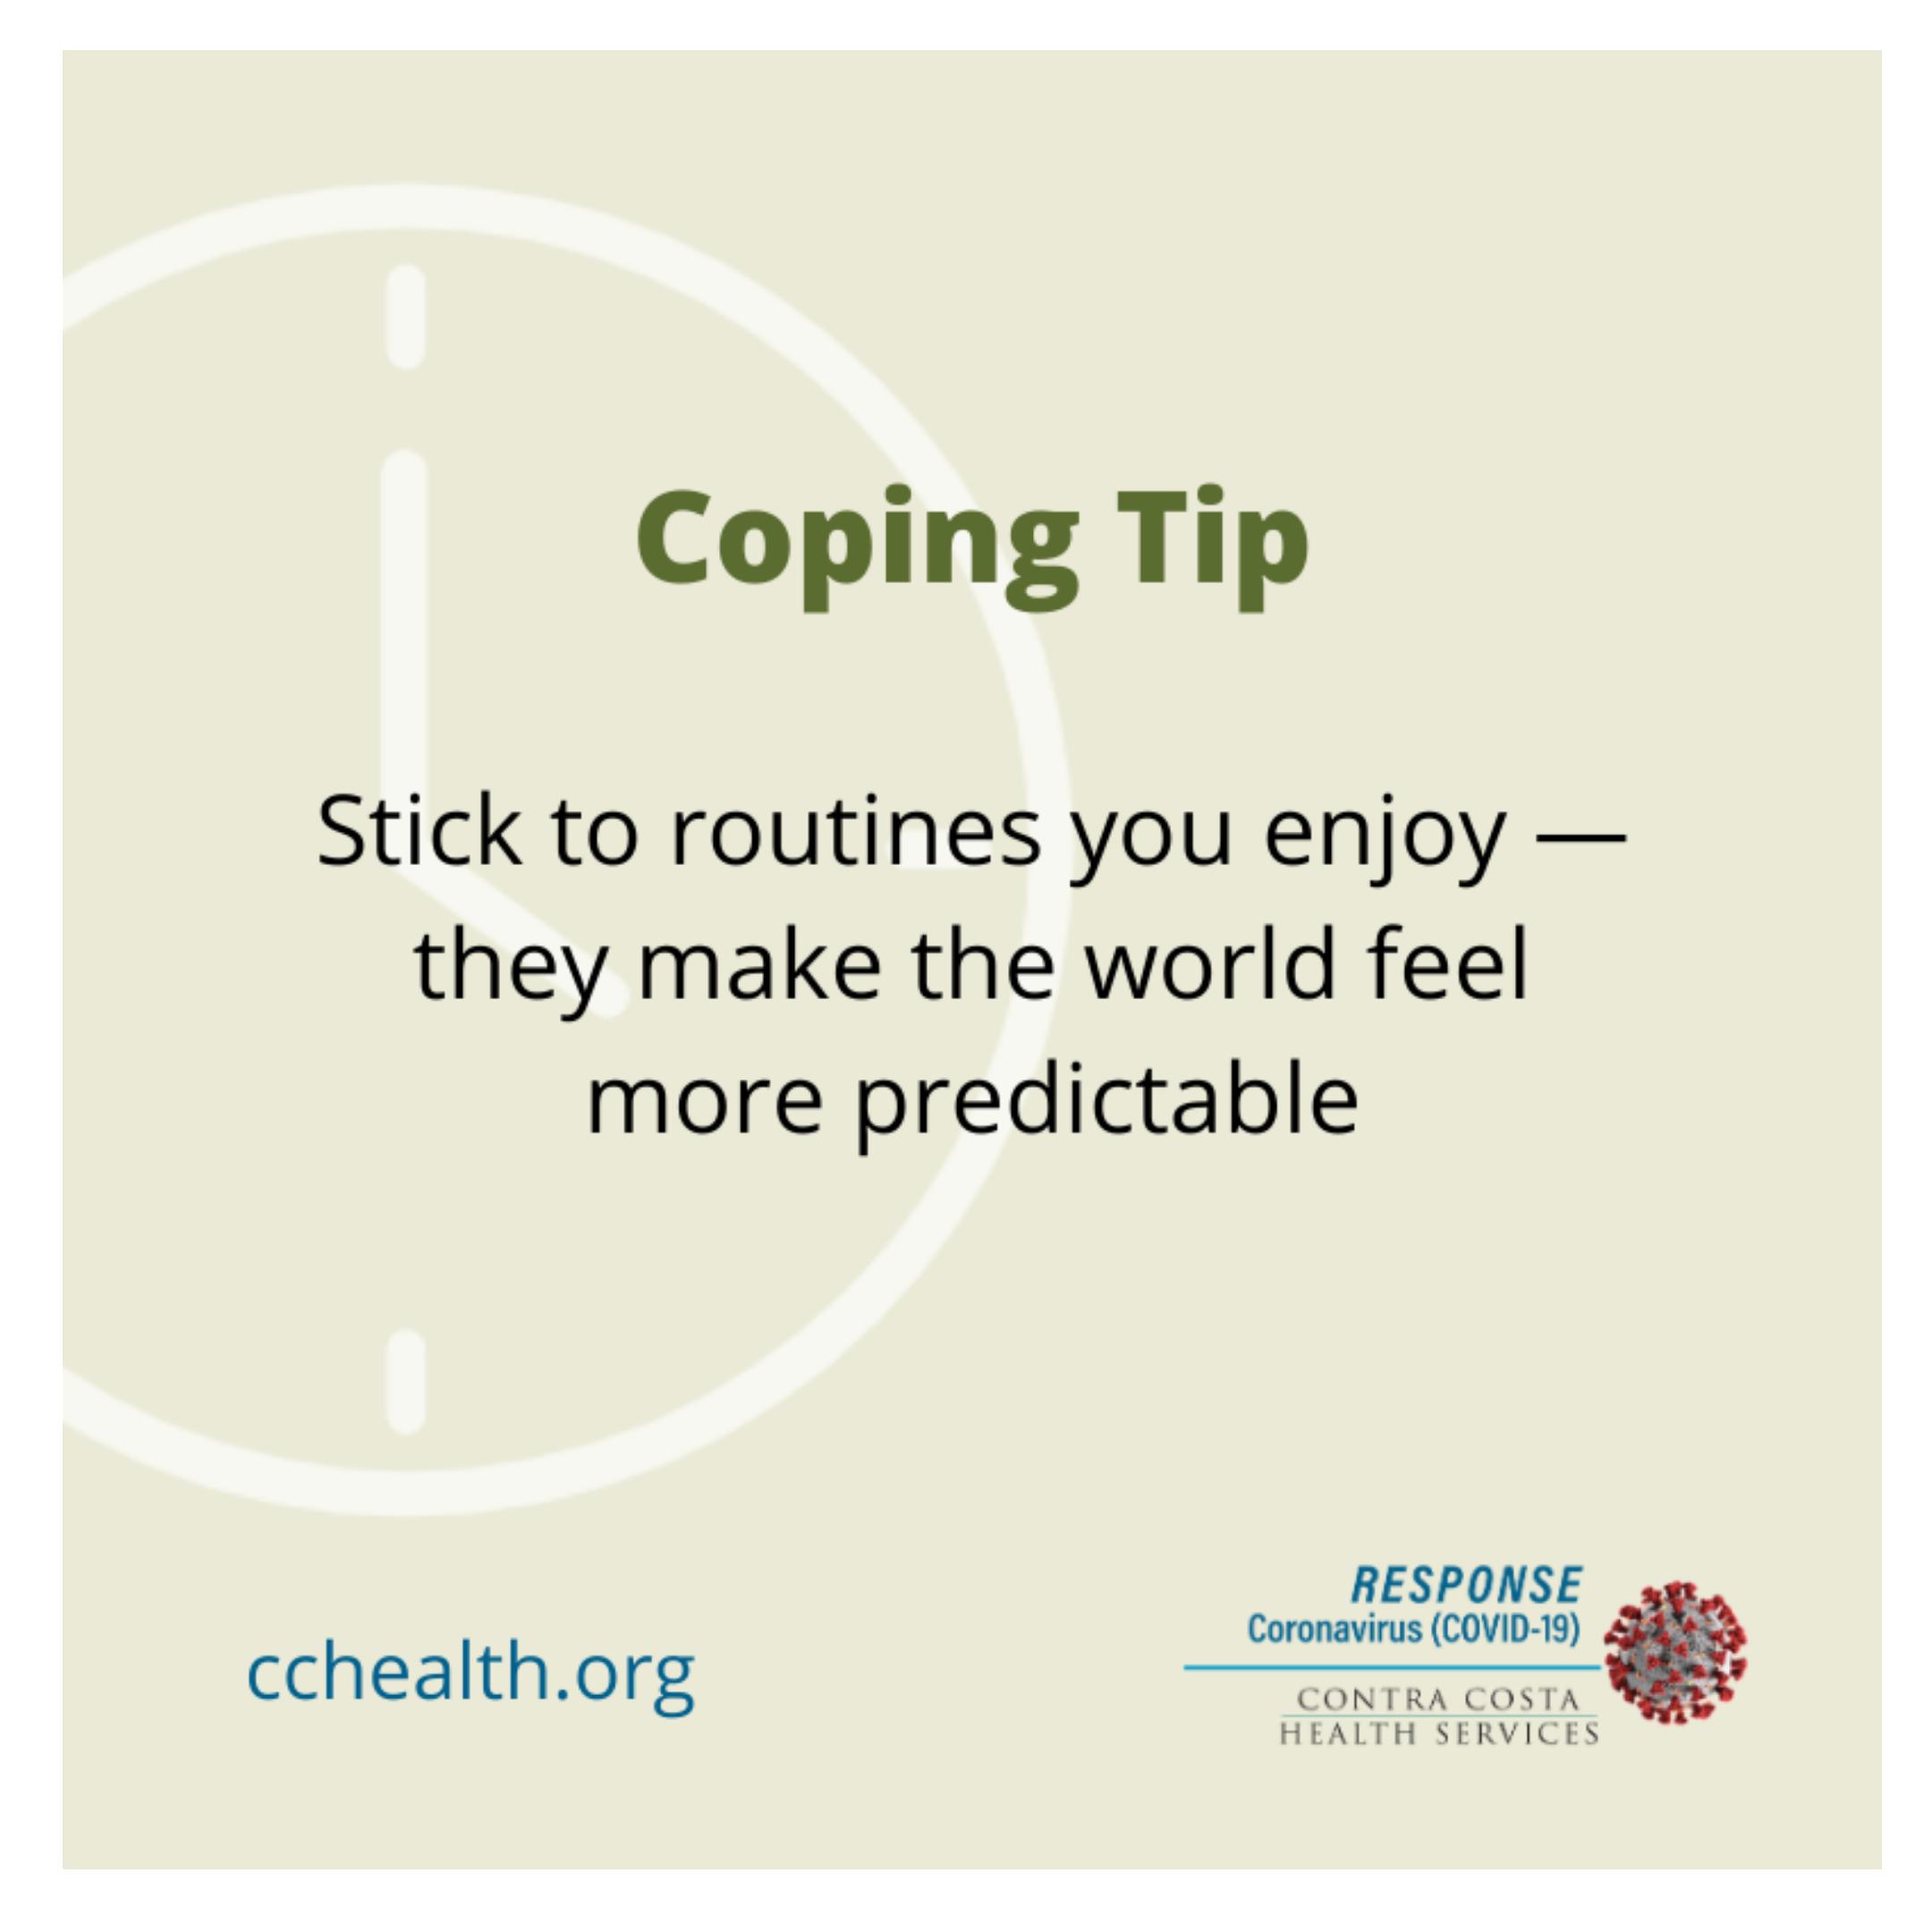 CCCHealth CopingTip Routines